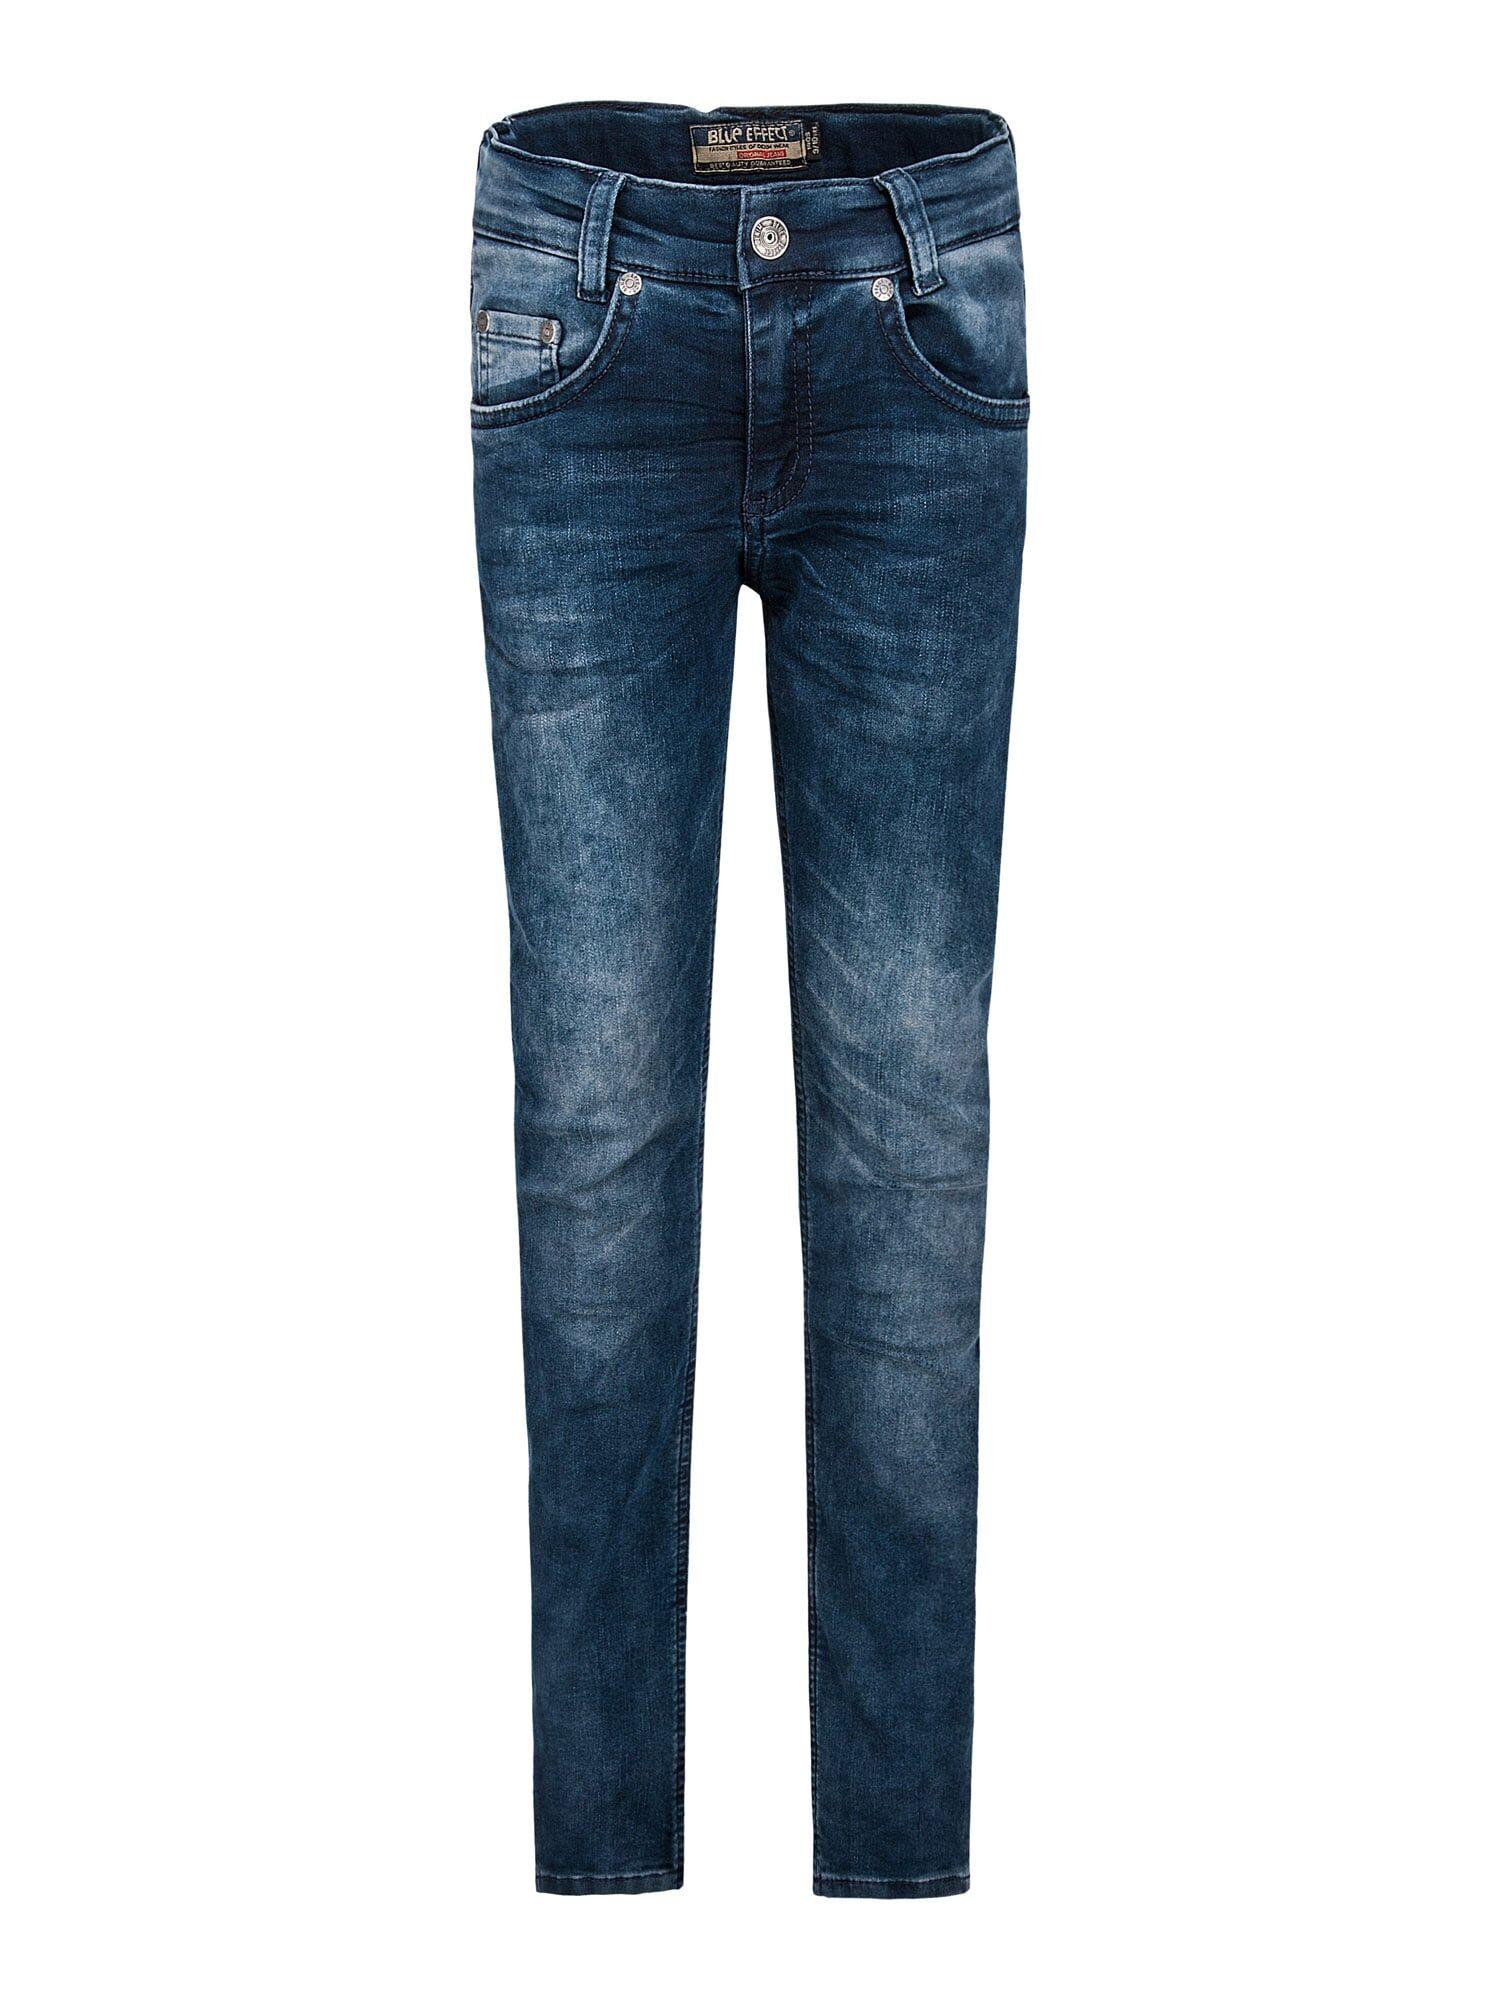 BLUE EFFECT Jean  - Bleu - Taille: 158 - boy